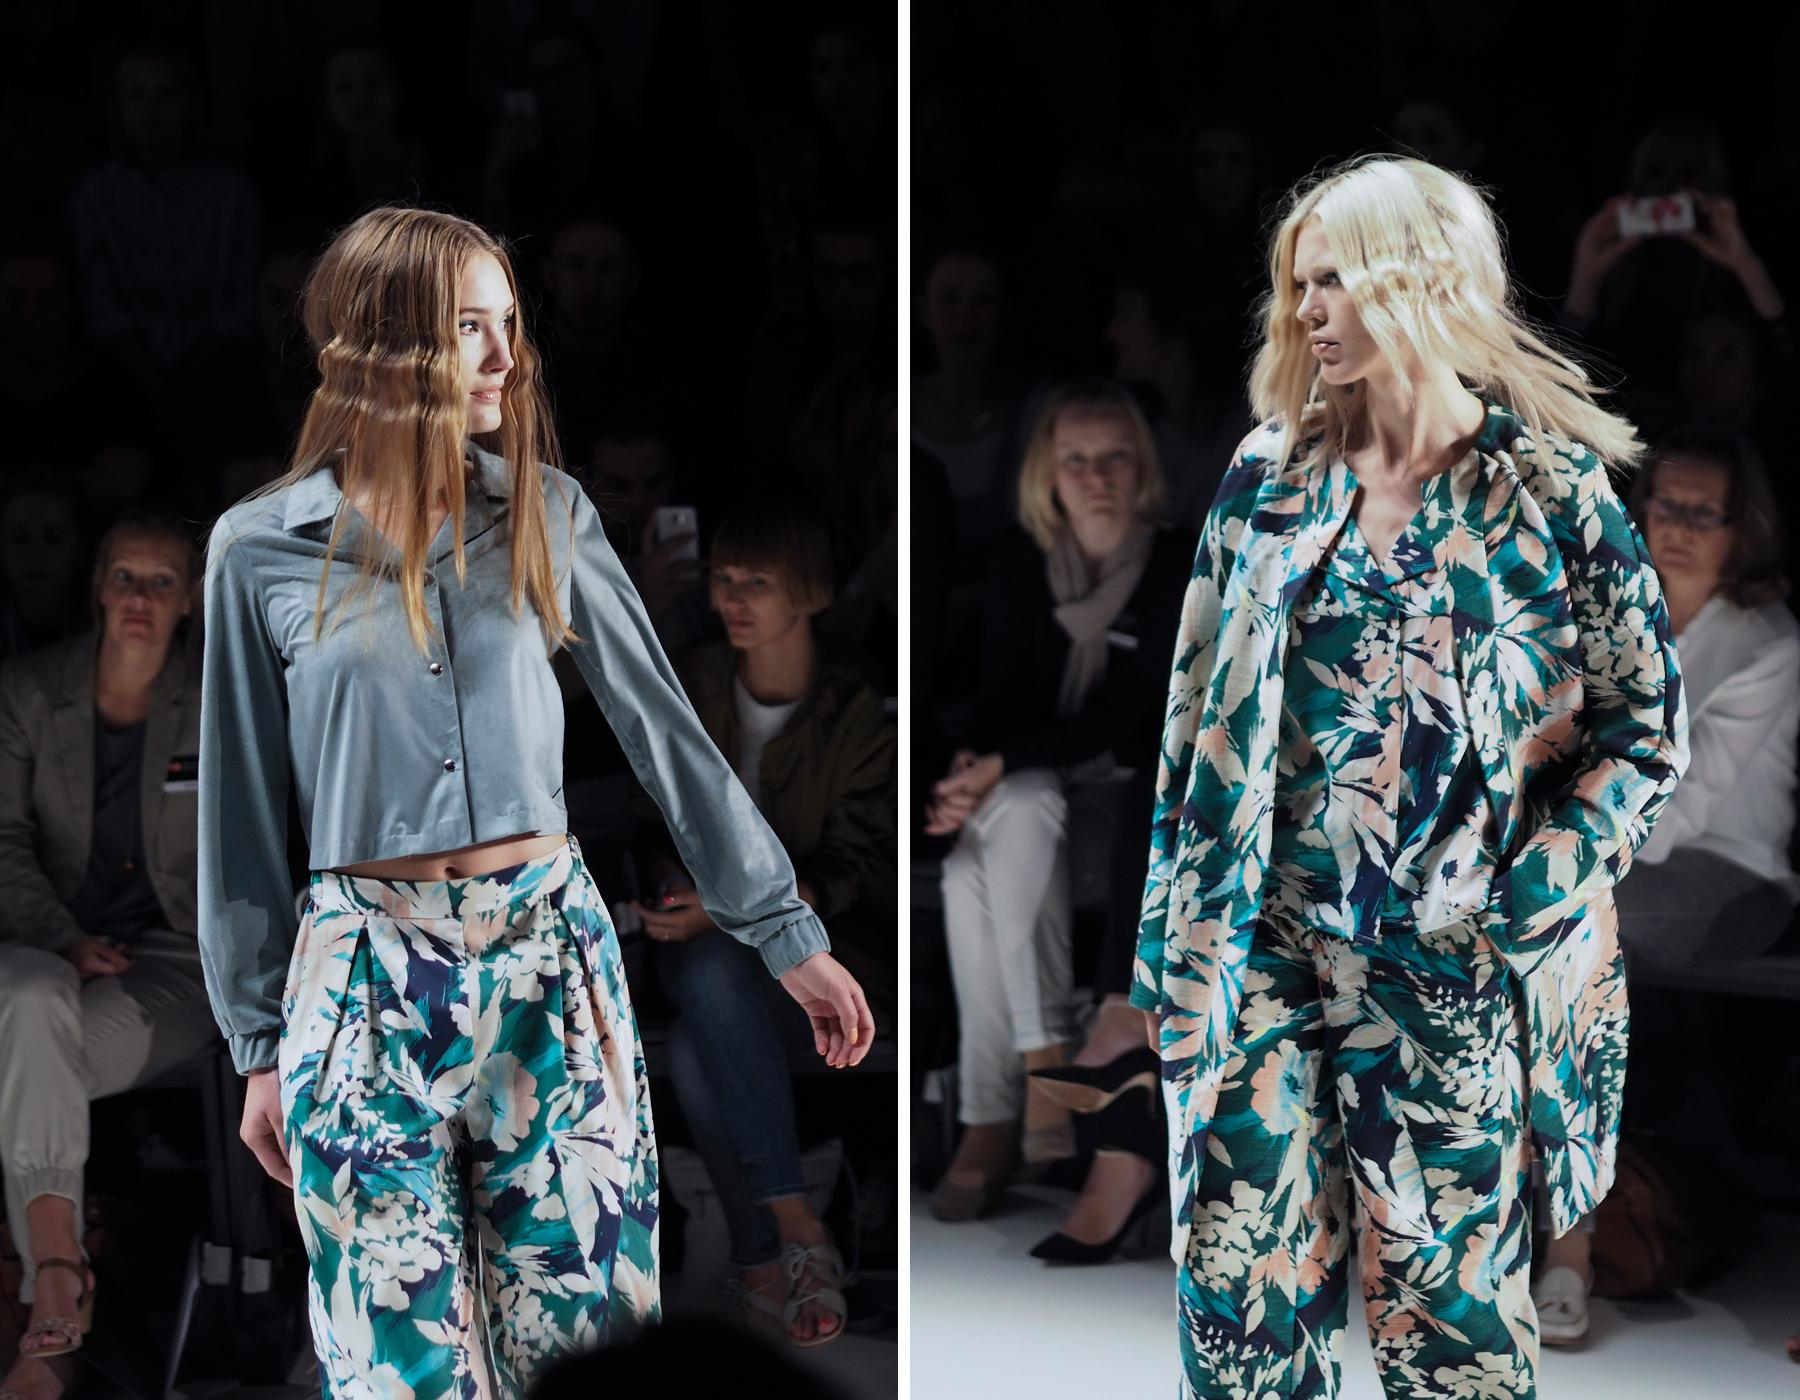 mercedes benz fashion week berlin mbfwb ss 2016 recap cats & dogs fashion blog ricarda schernus 11